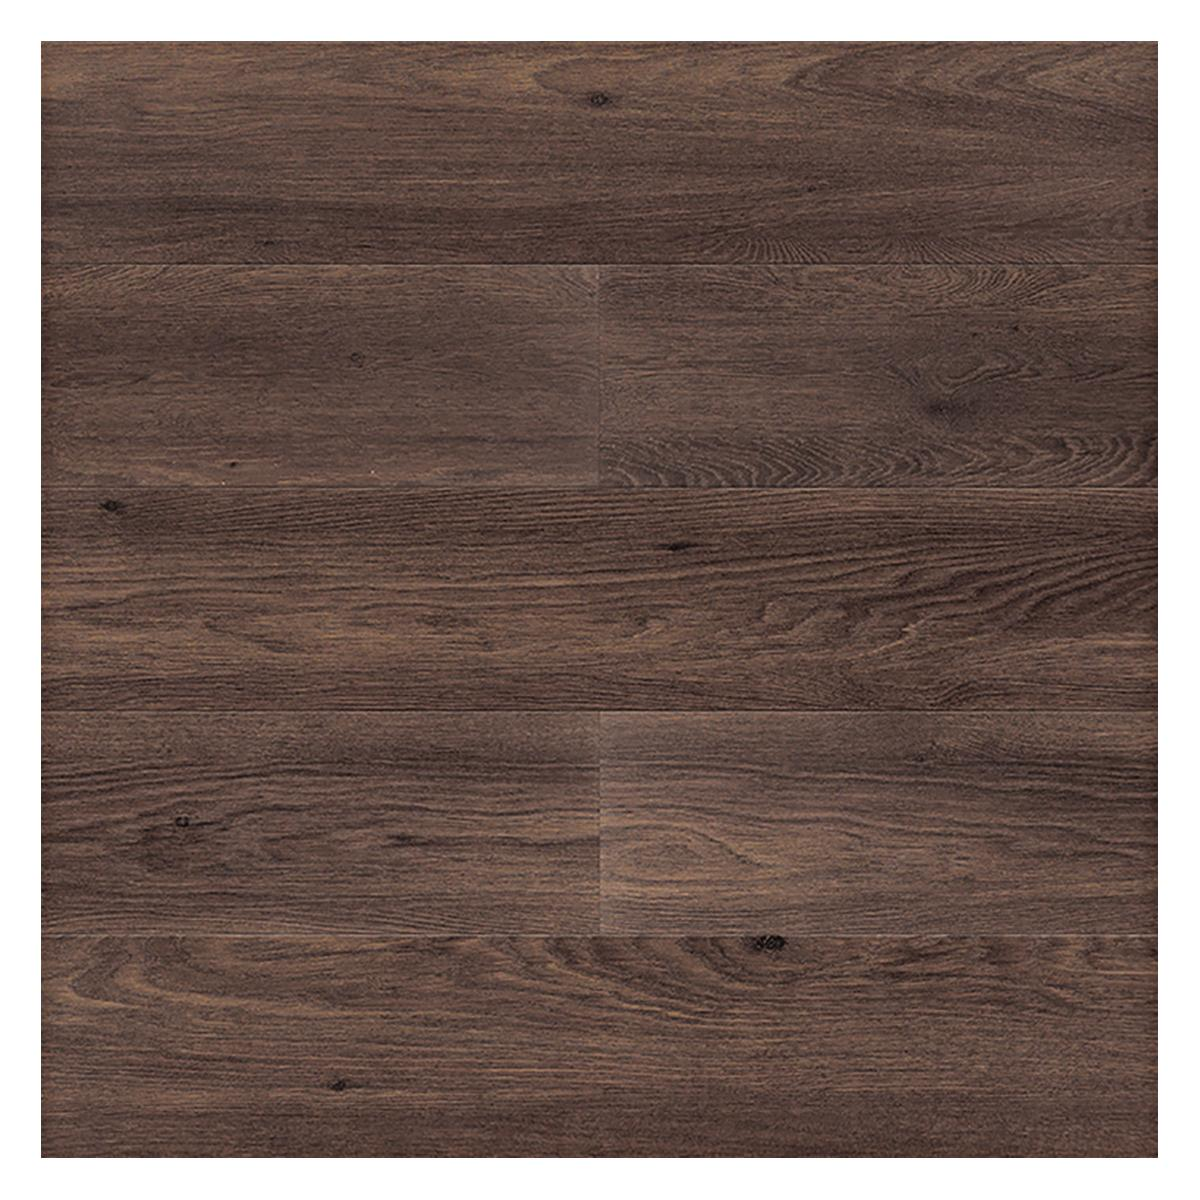 Piso LaminadoHabitat Marrón Oscuro Mate - 19.2X128.5 cm - 2.22 m2